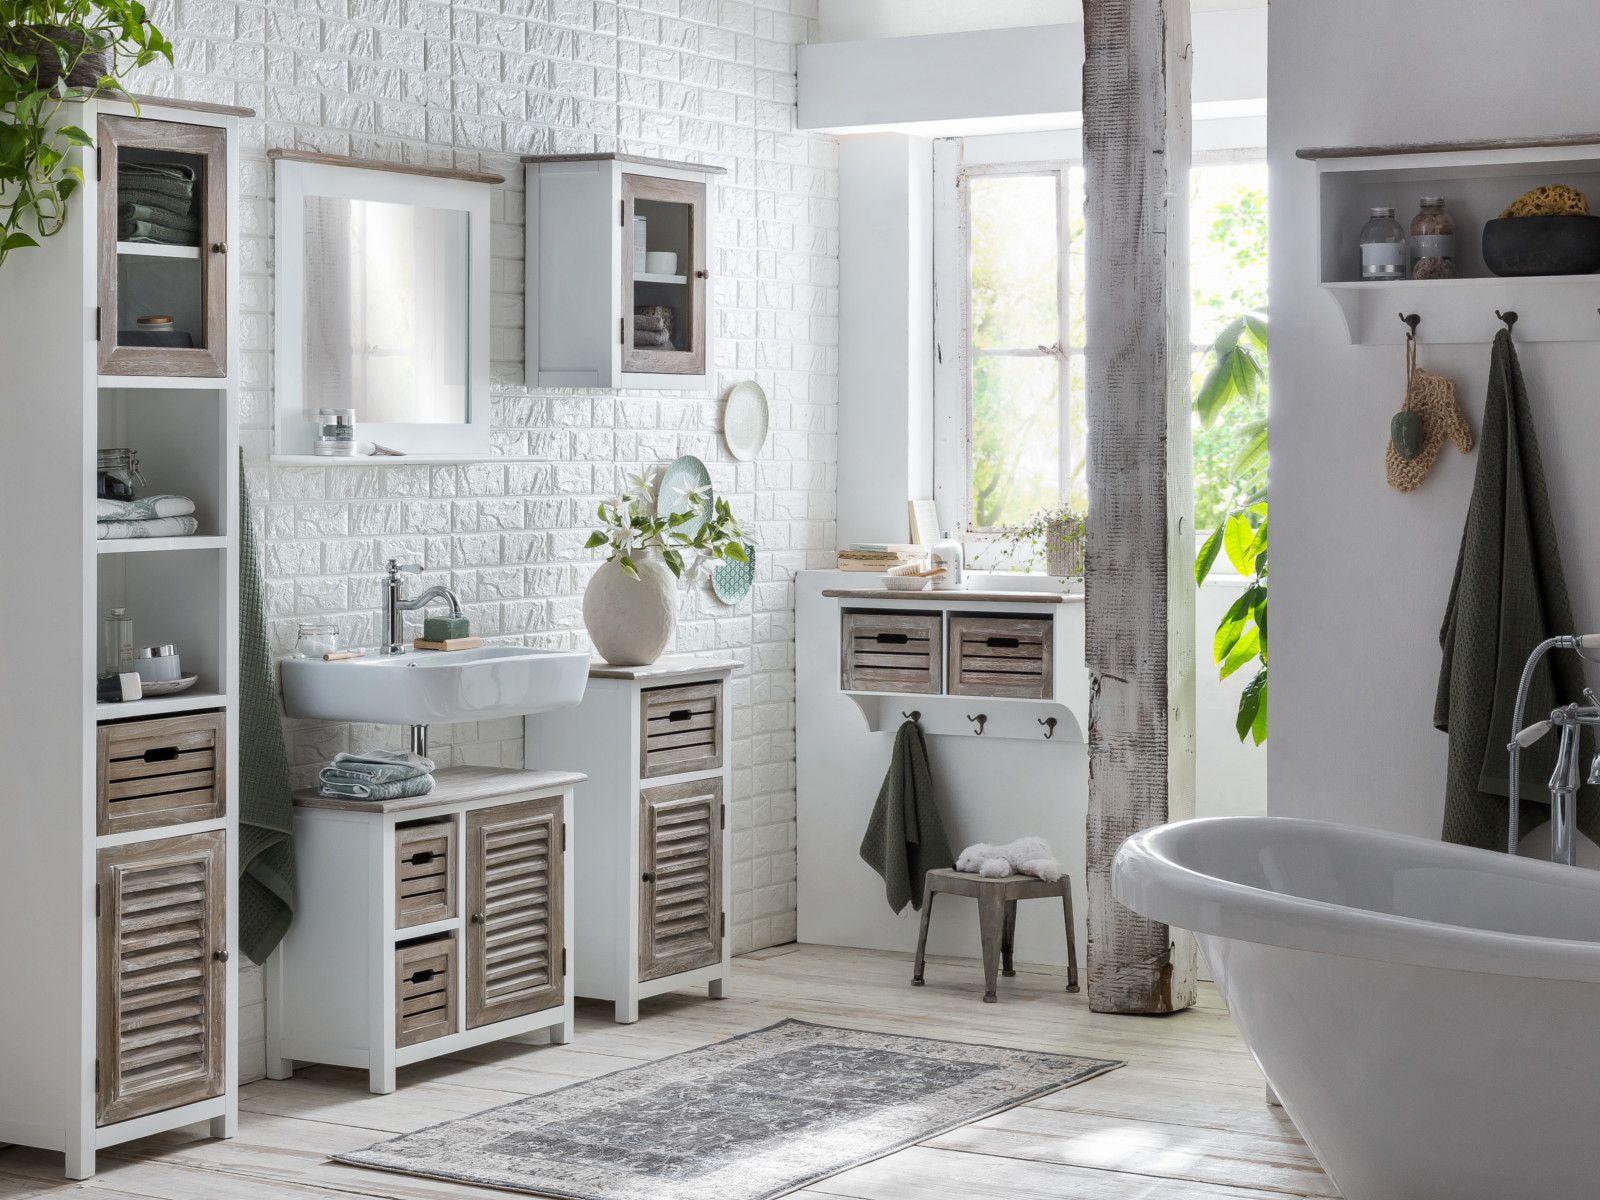 Badmobel Set Kansas Kleine Badezimmer Badezimmer Inspiration Landhausstil